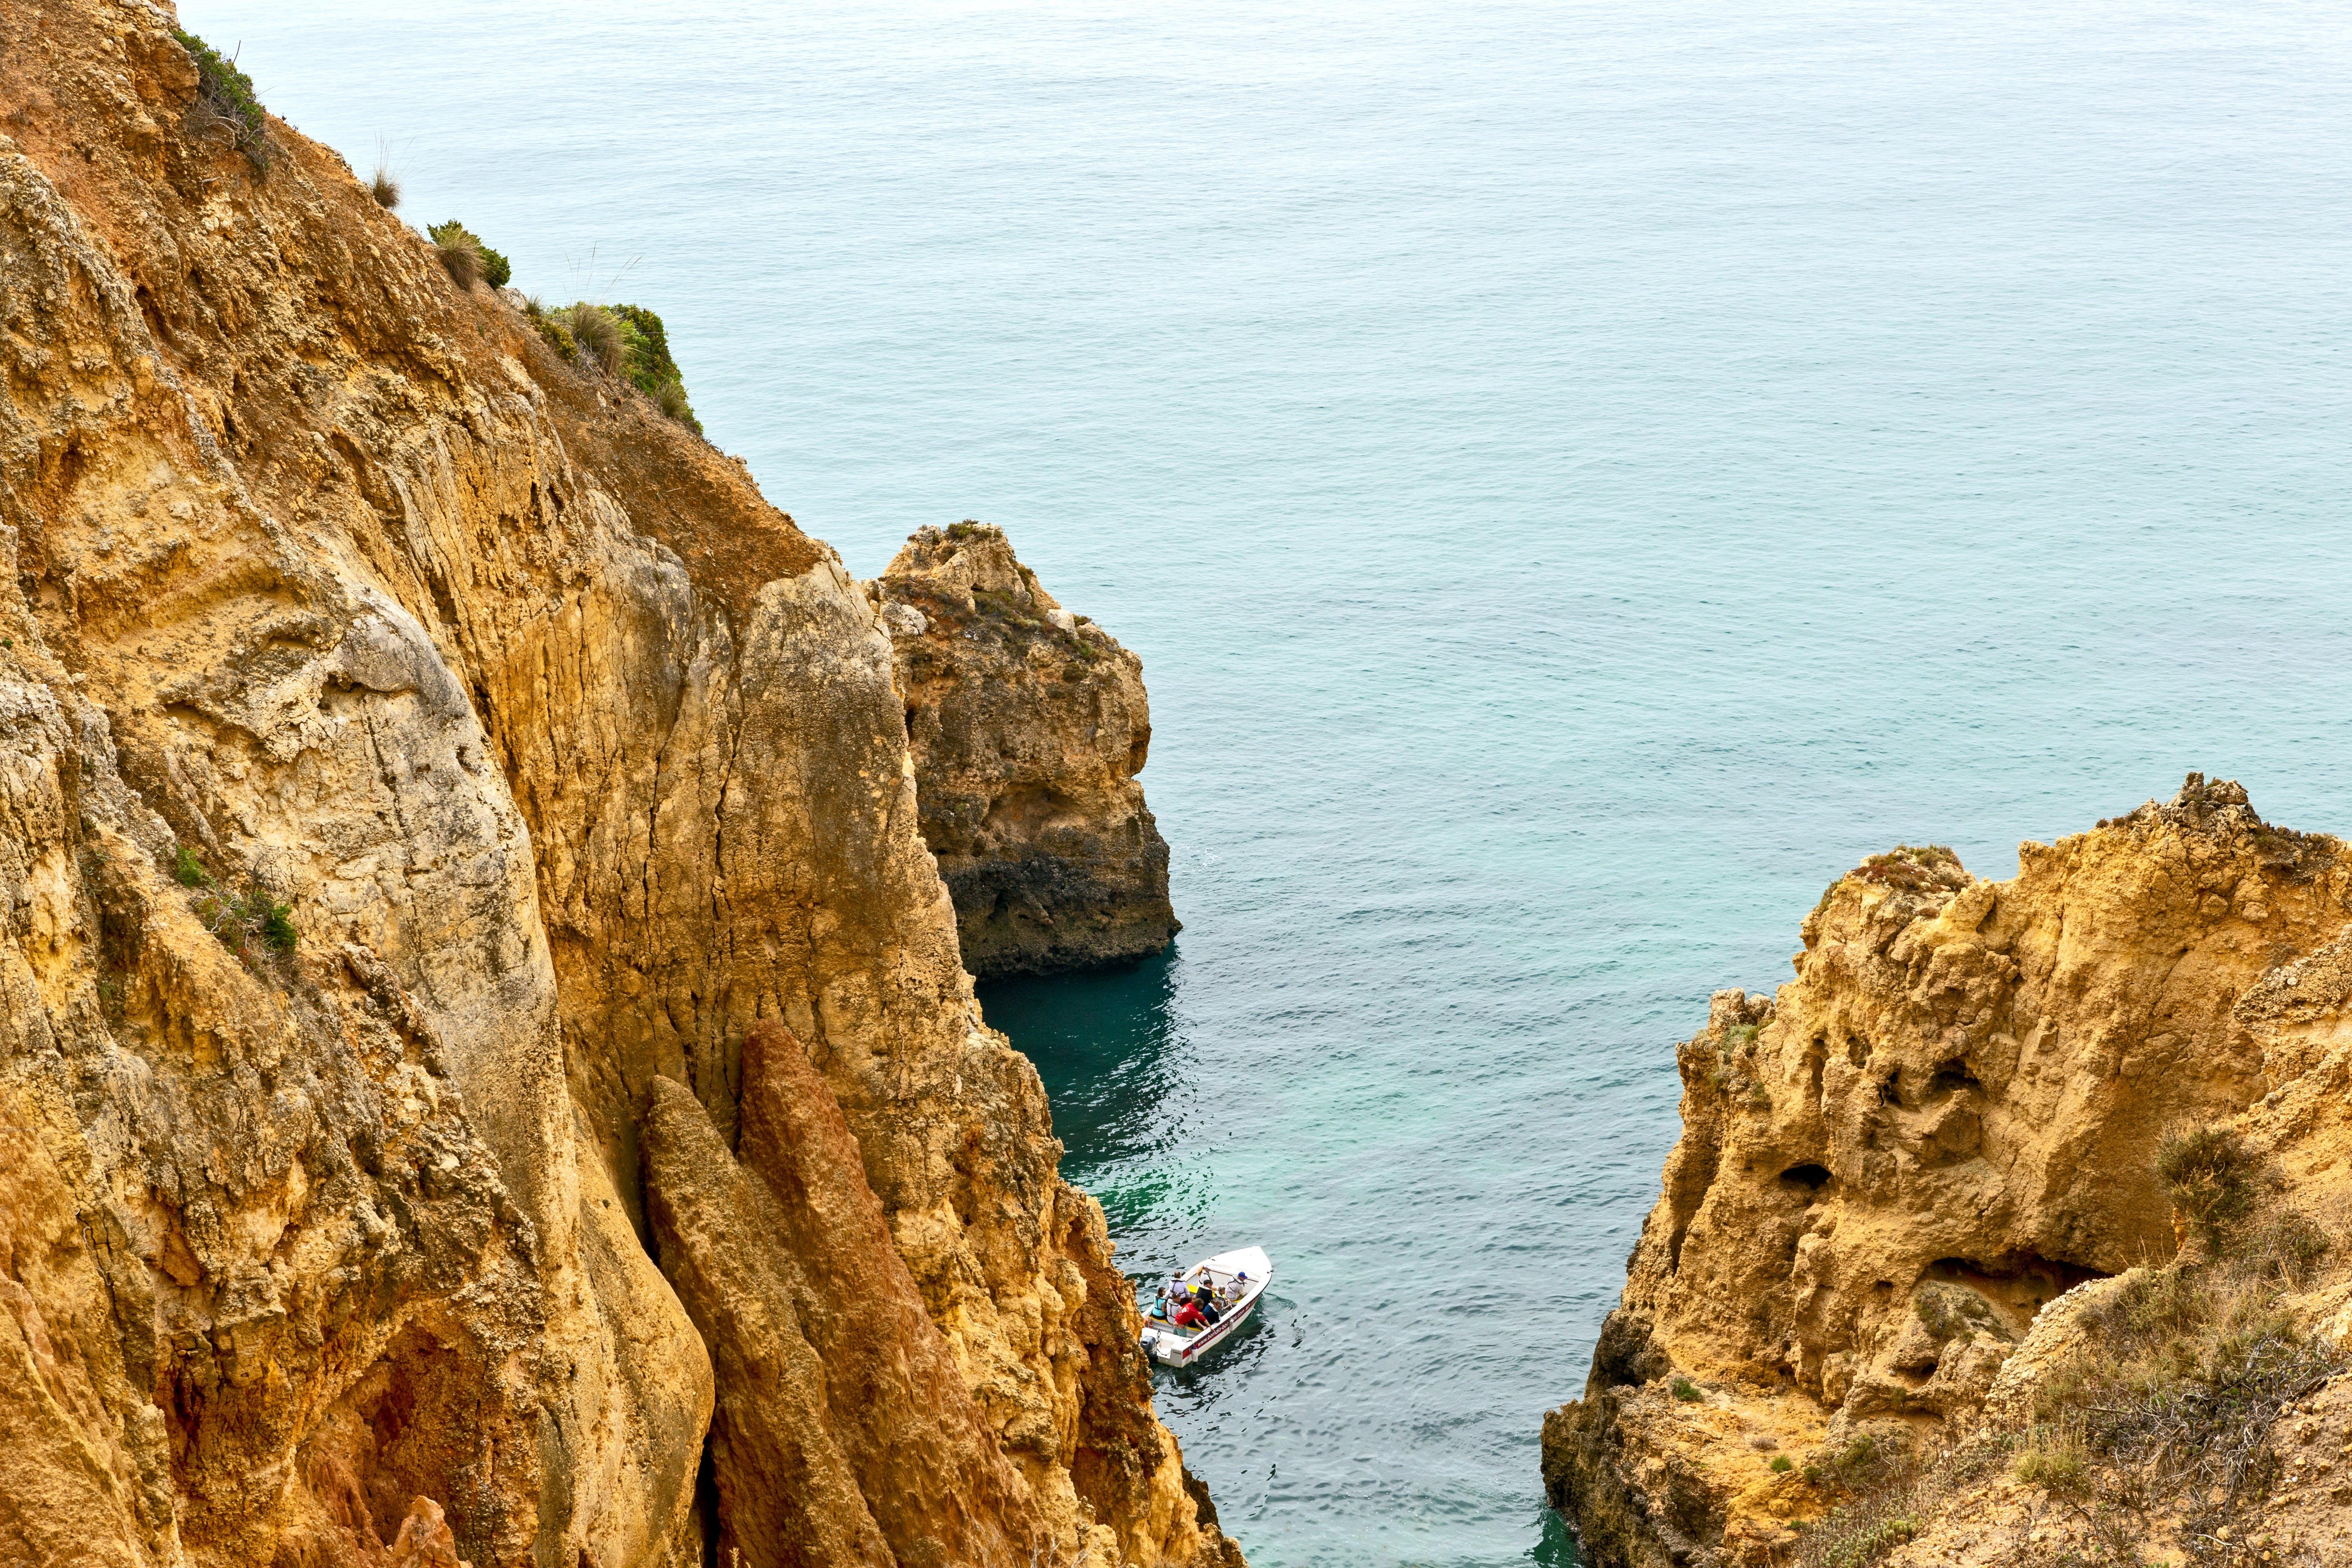 White Boat Near Cliff